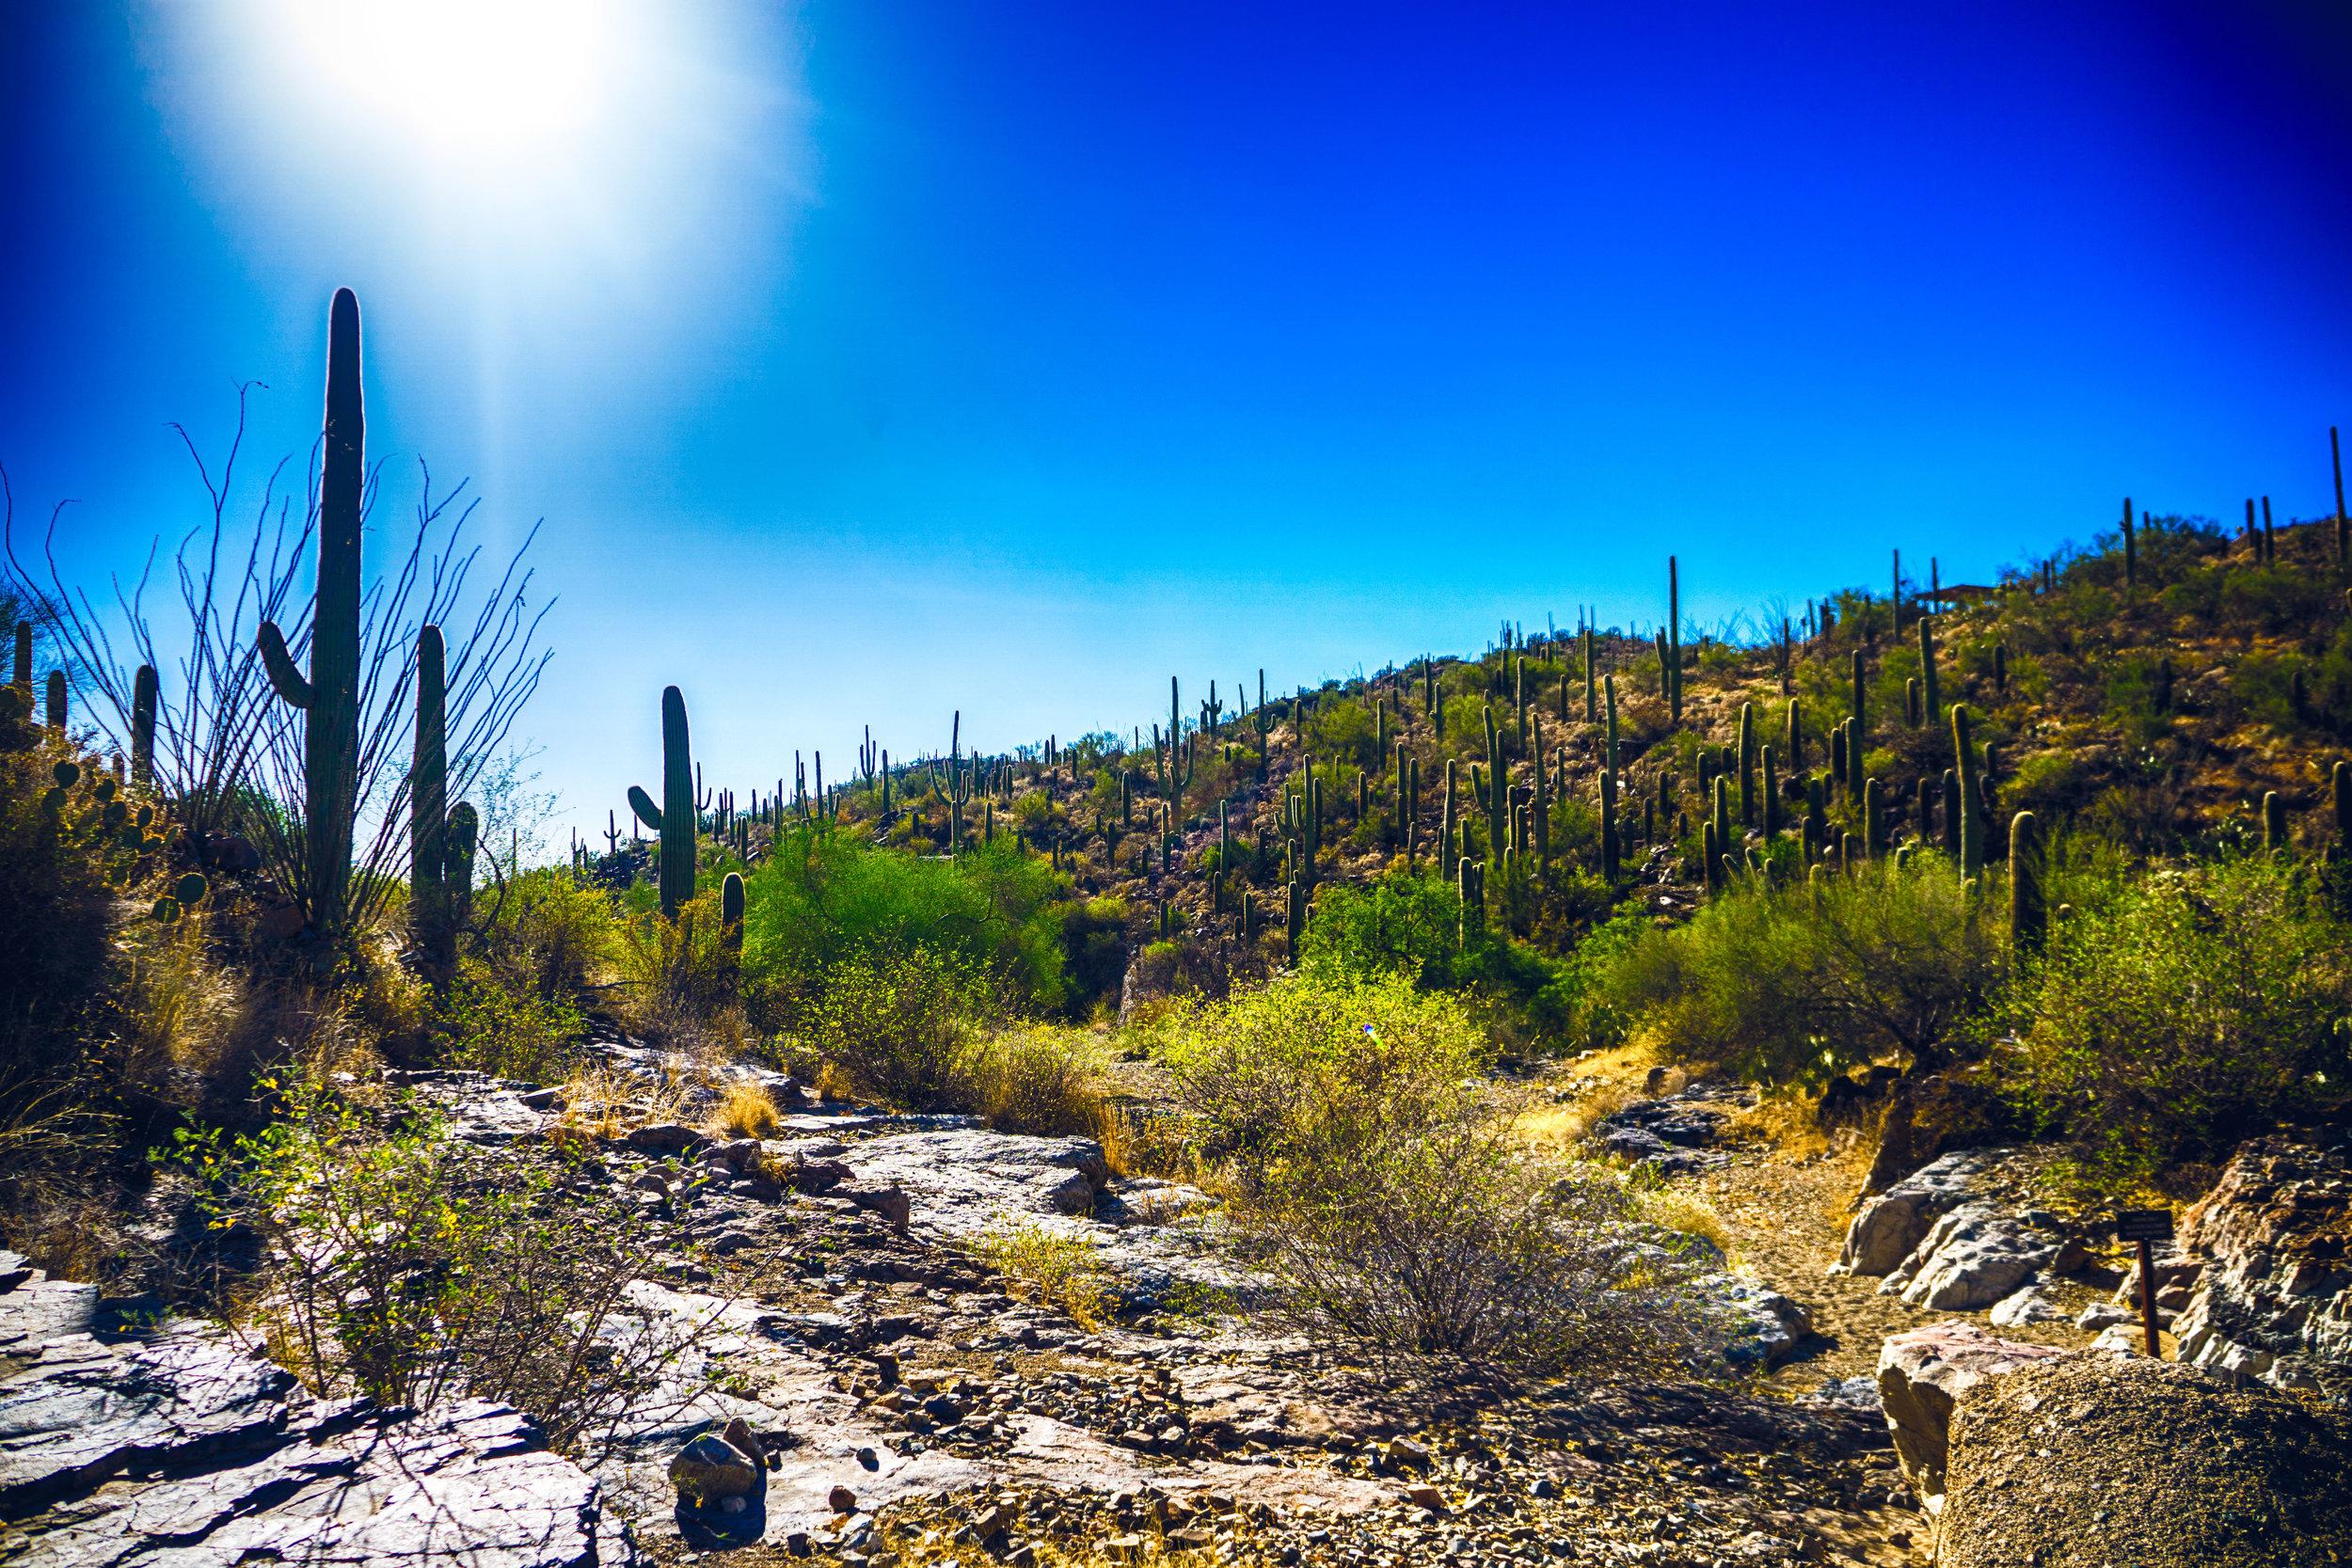 vickygood_photography_nature_saguaro-park12.jpg